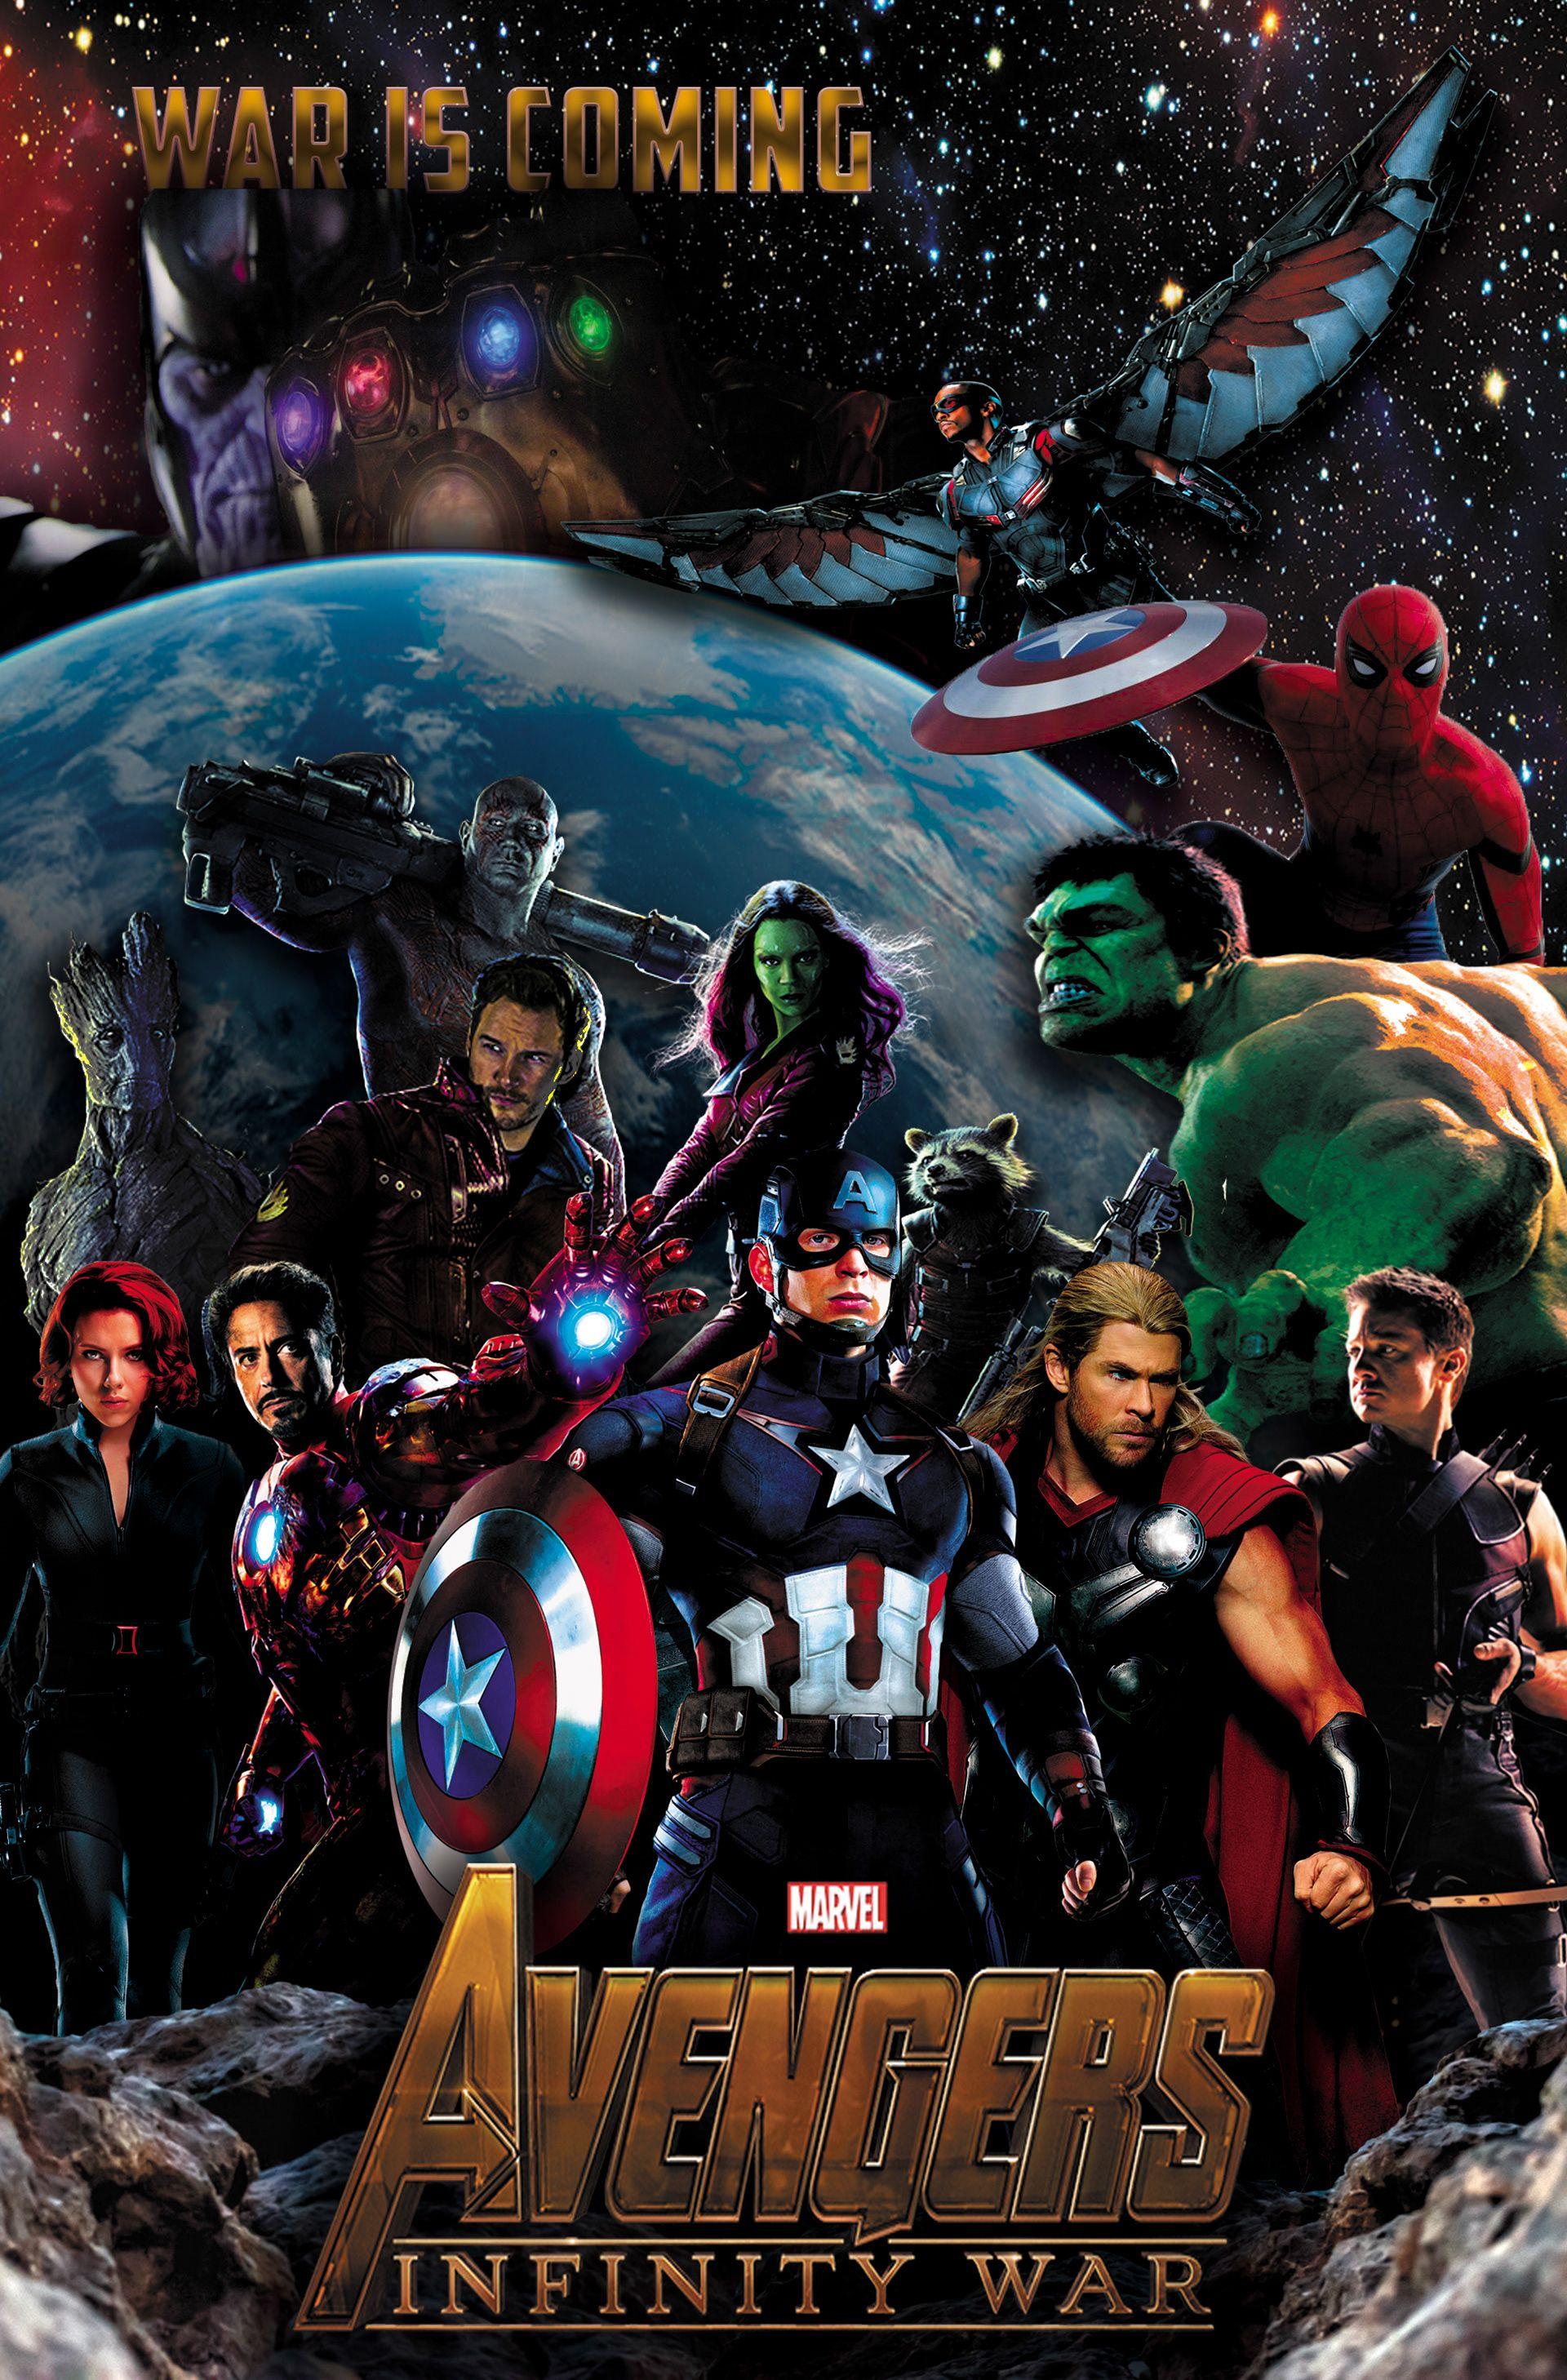 Avengers infinity war poster avengers infinity war - Images avengers ...